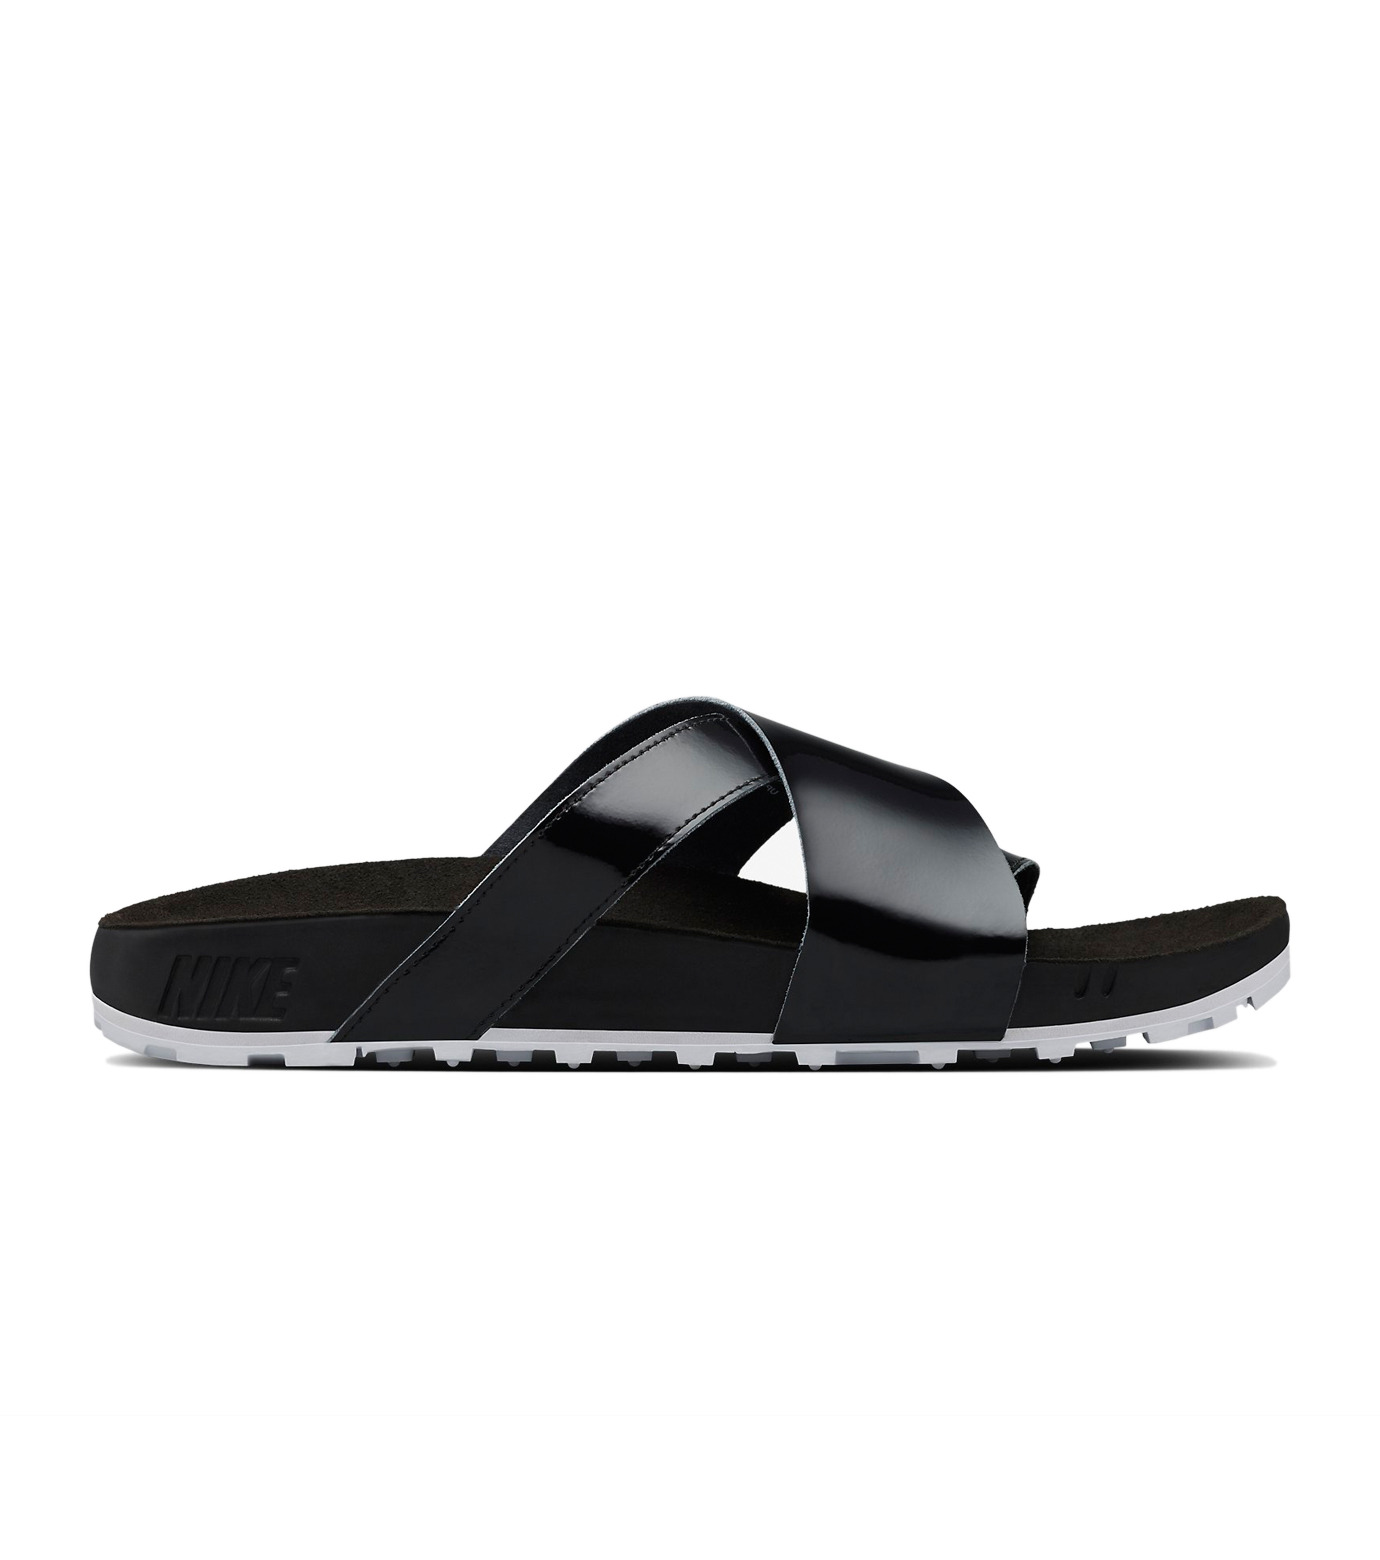 NIKE(ナイキ)のTaupo-BLACK(シューズ/shoes)-849756-001-13 拡大詳細画像1